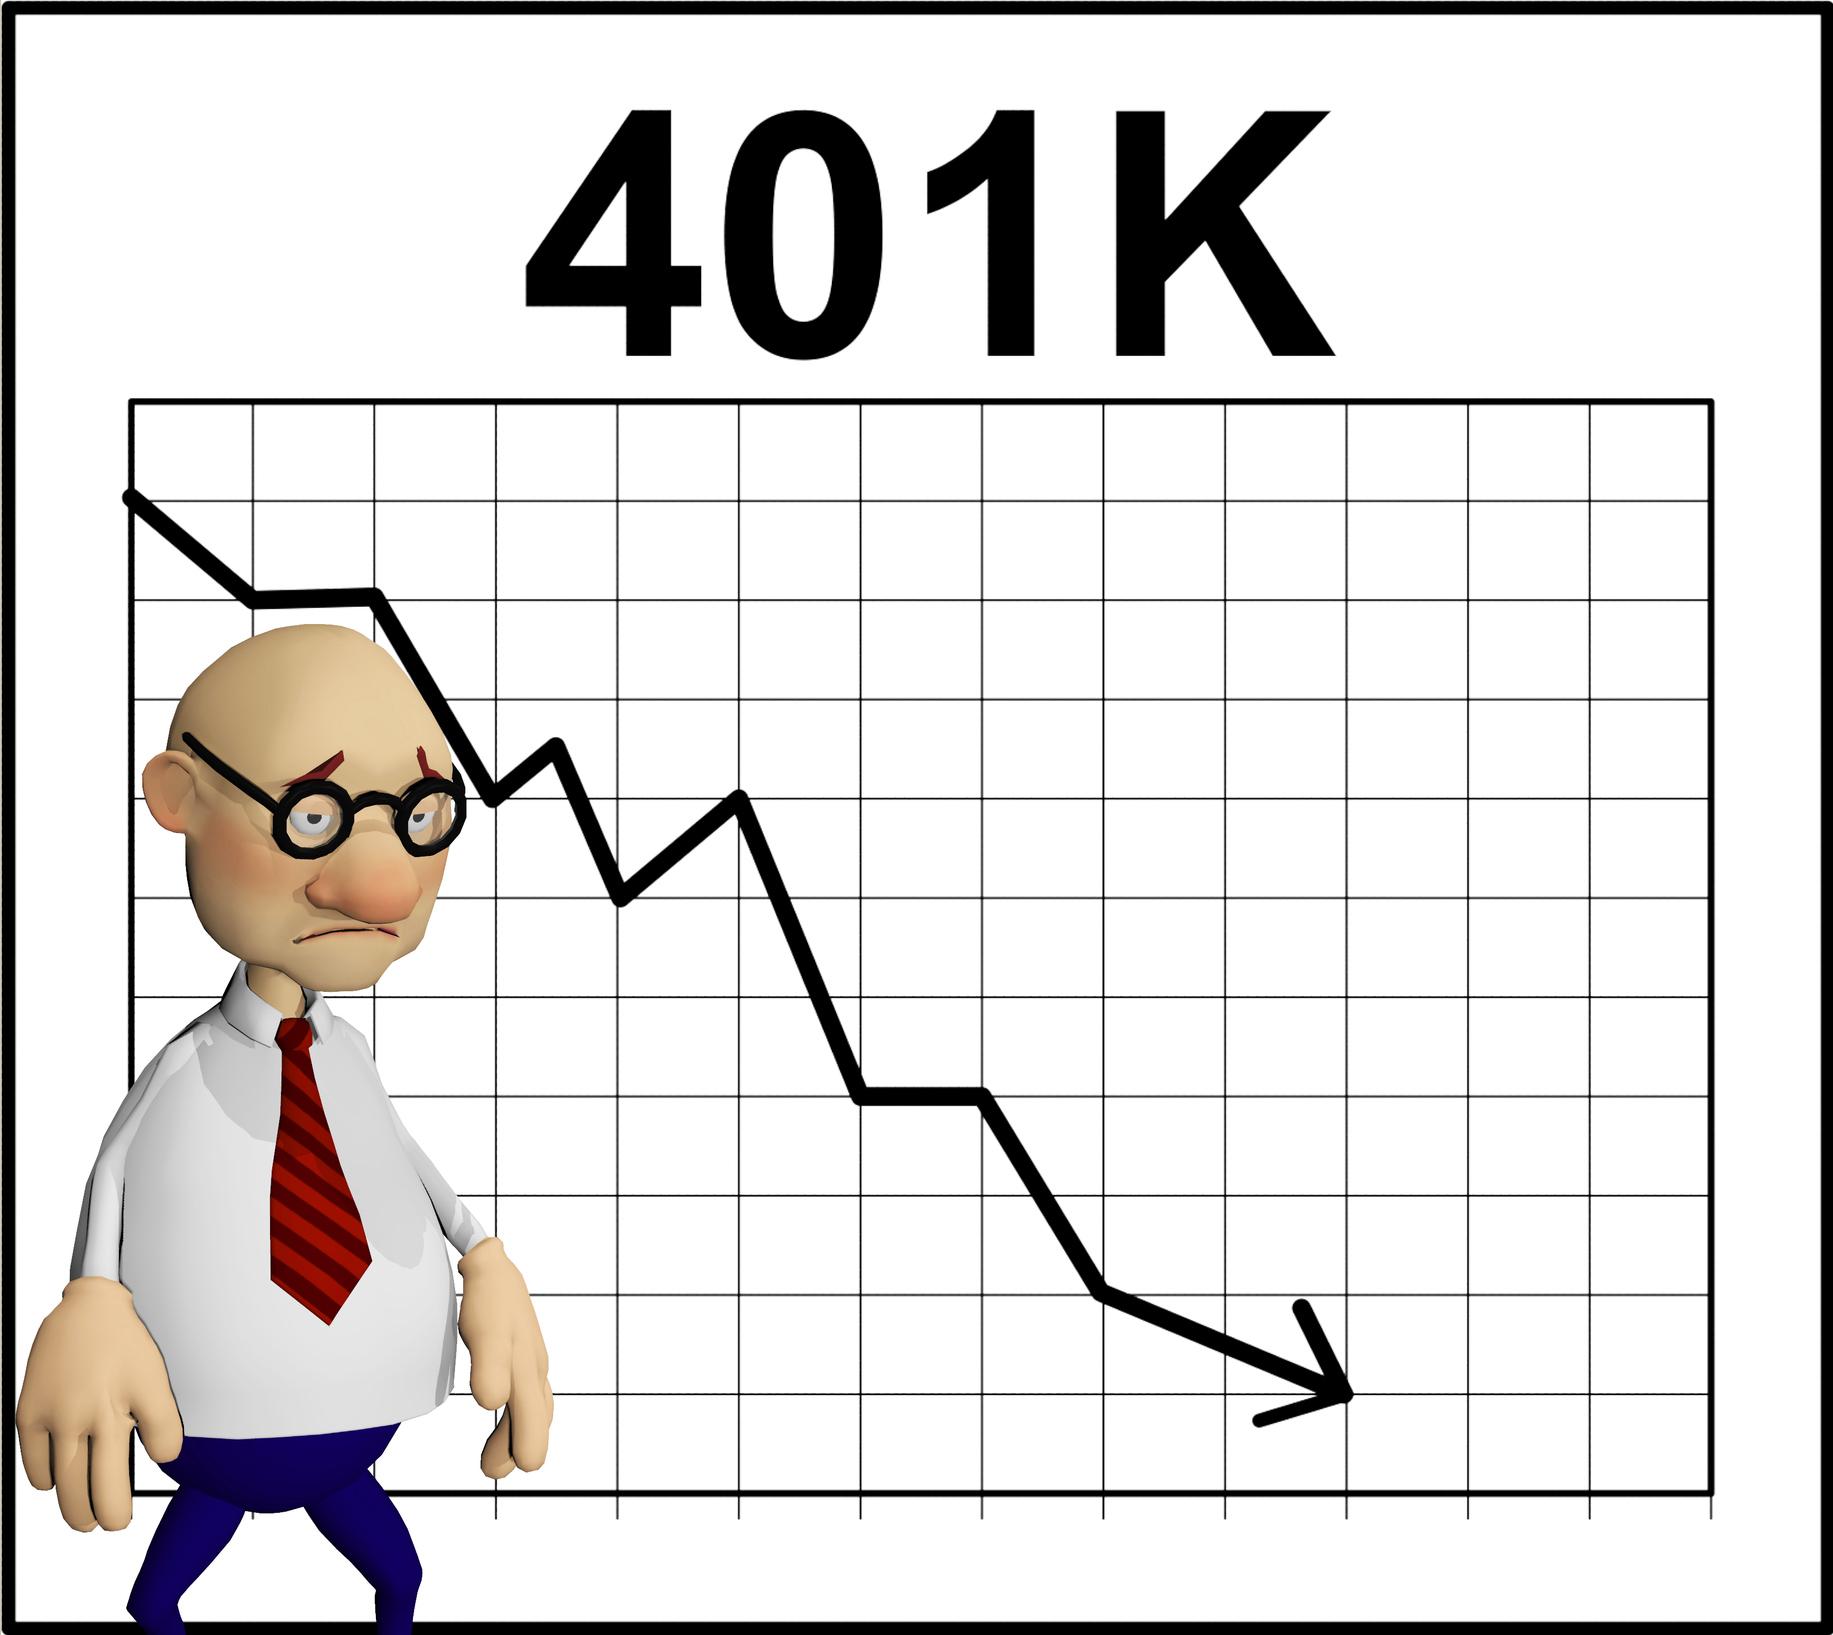 Sad guy with 401(k) graph